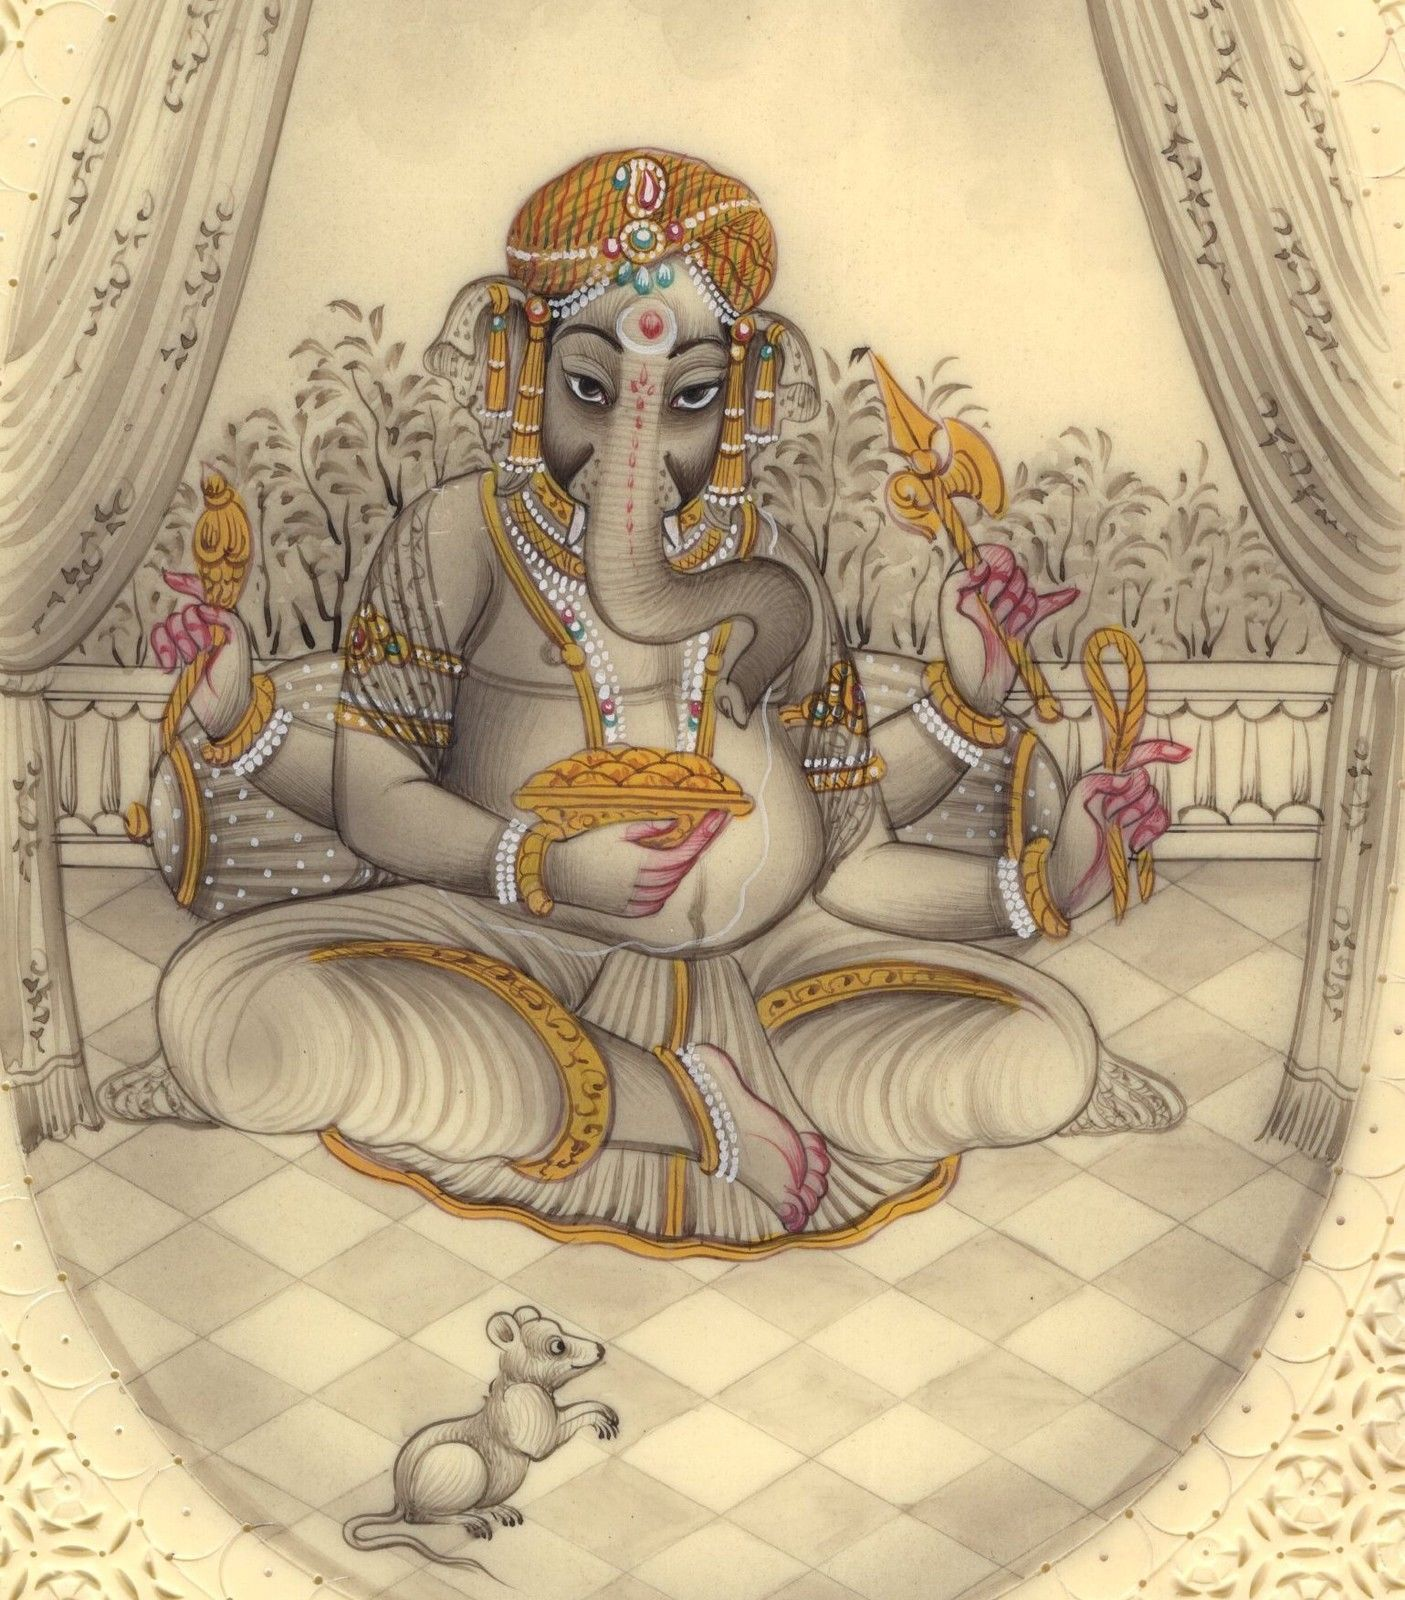 Ganesha Hindu Miniature Painting Handmade Indian Religious Lord Ganesh Decor Art